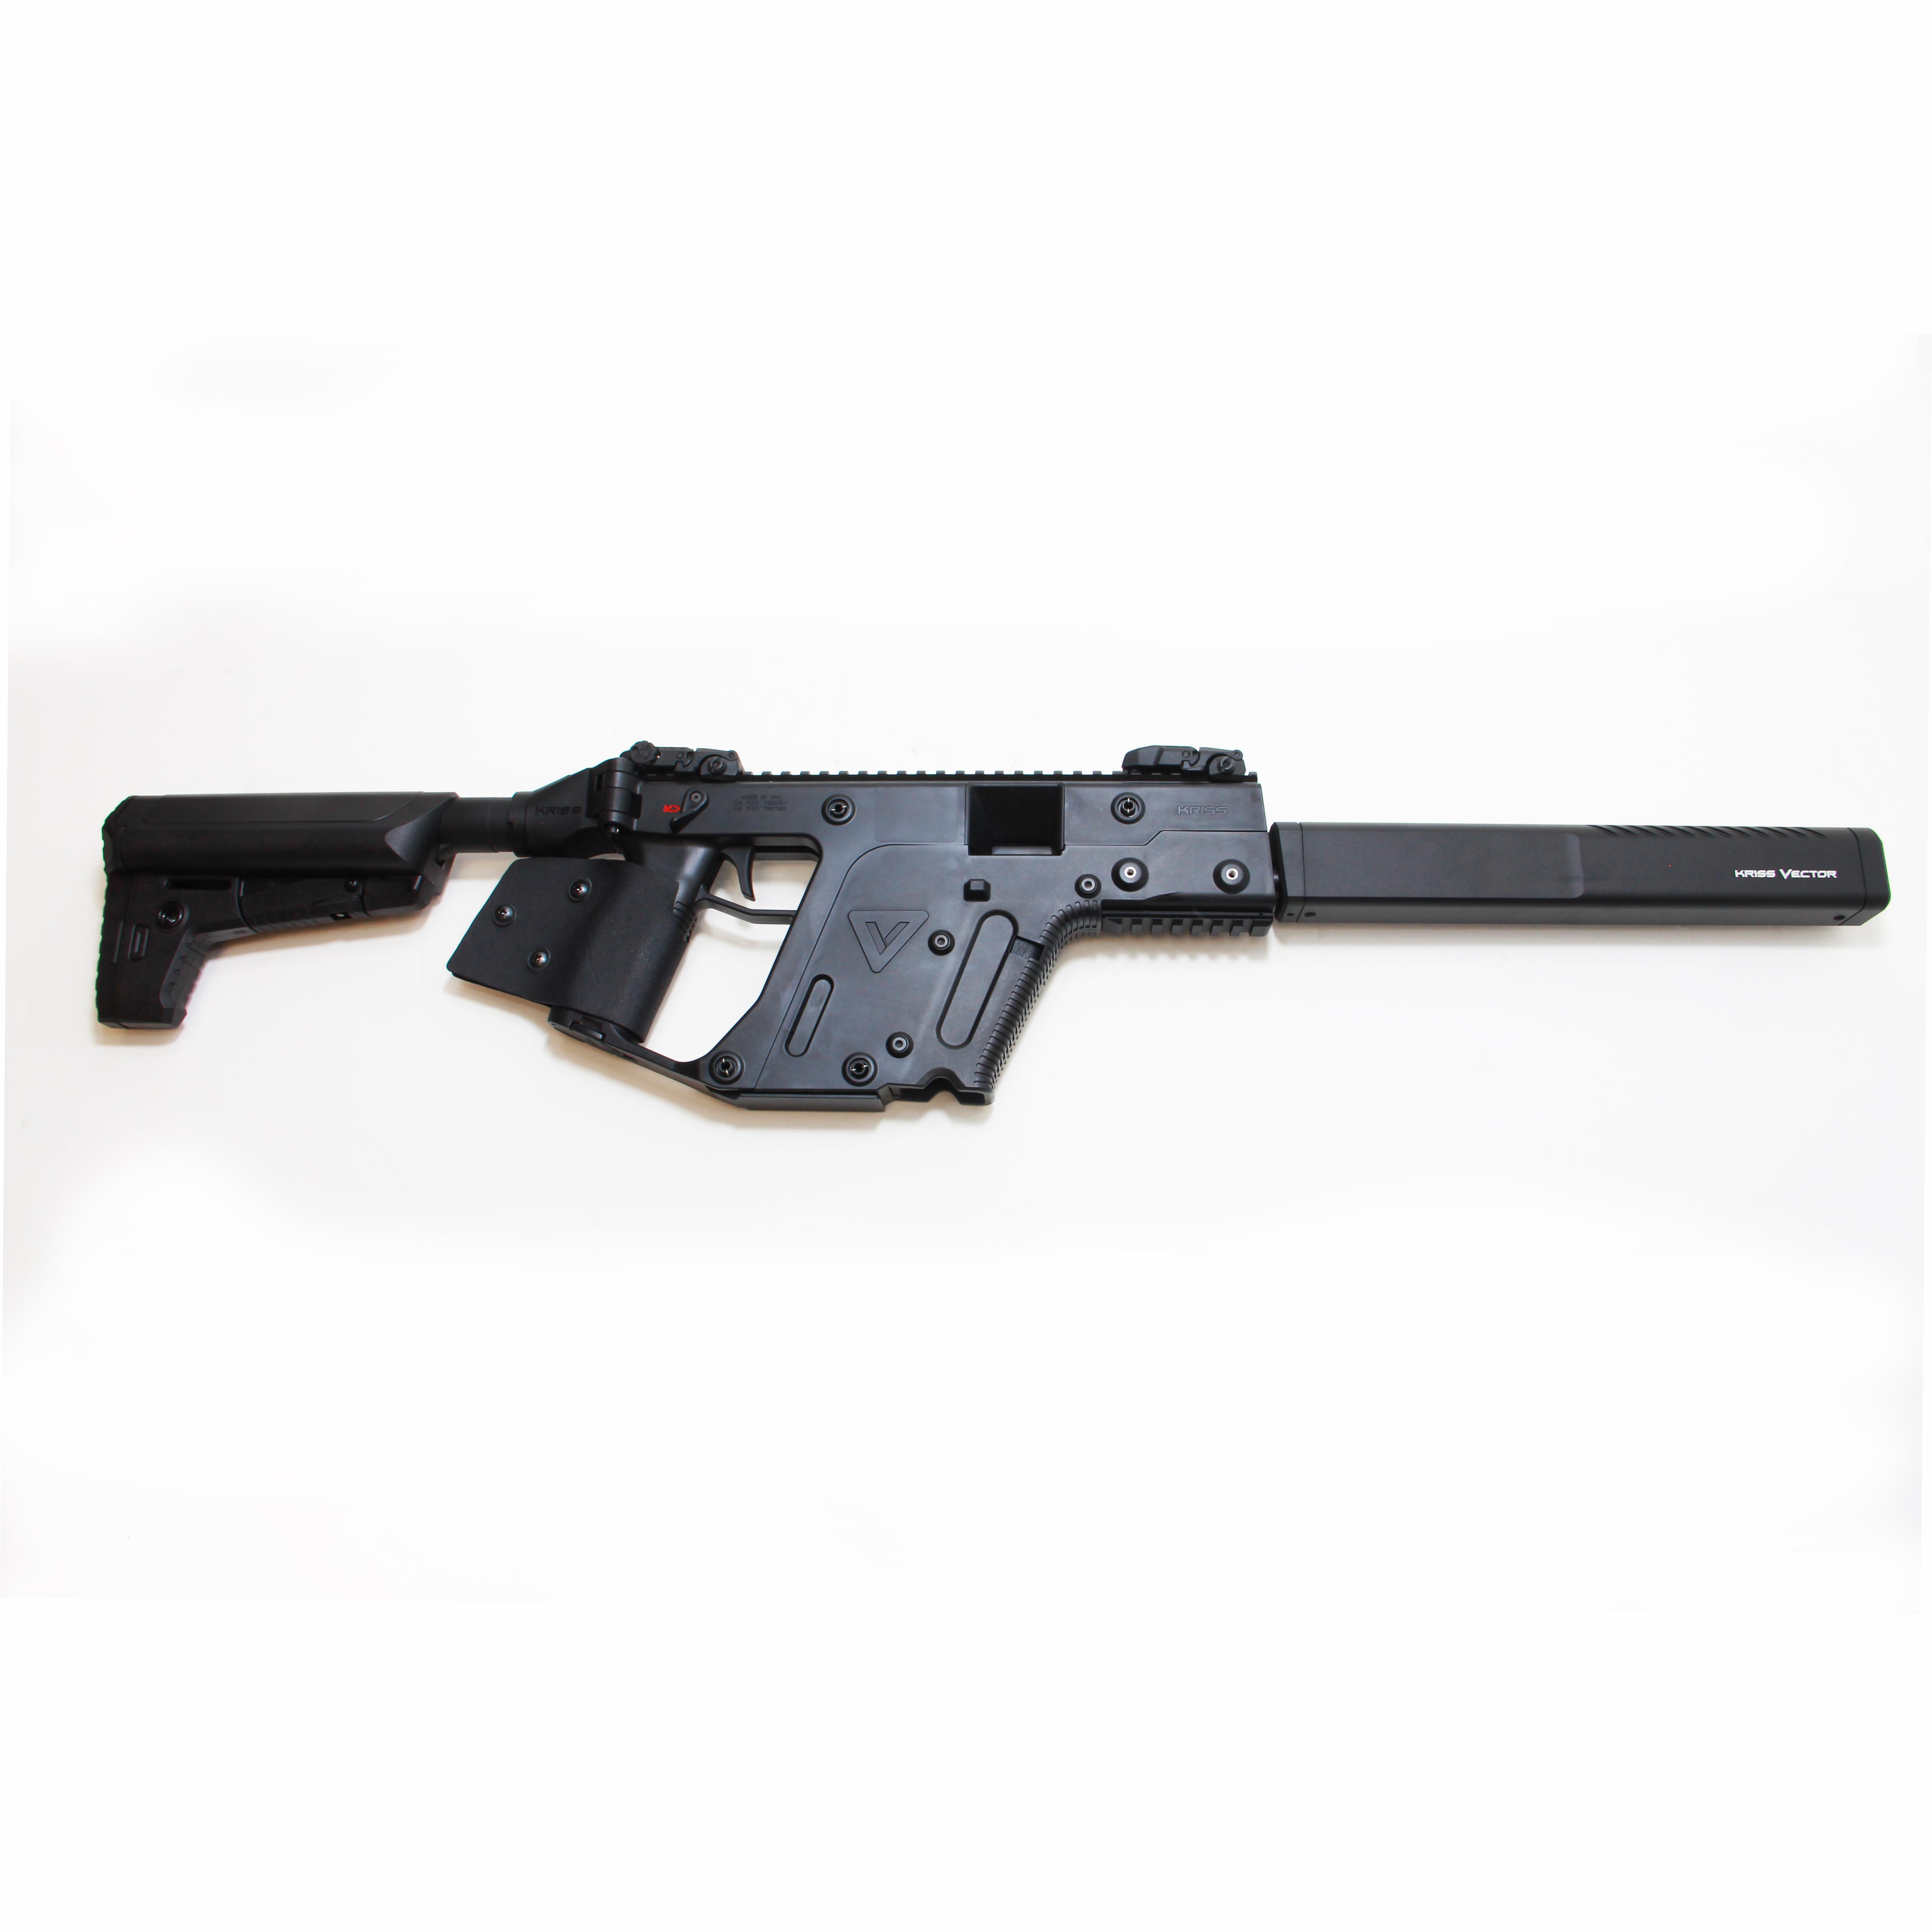 5214x5214 Kriss Vector Crb Gen 2 45acp Black